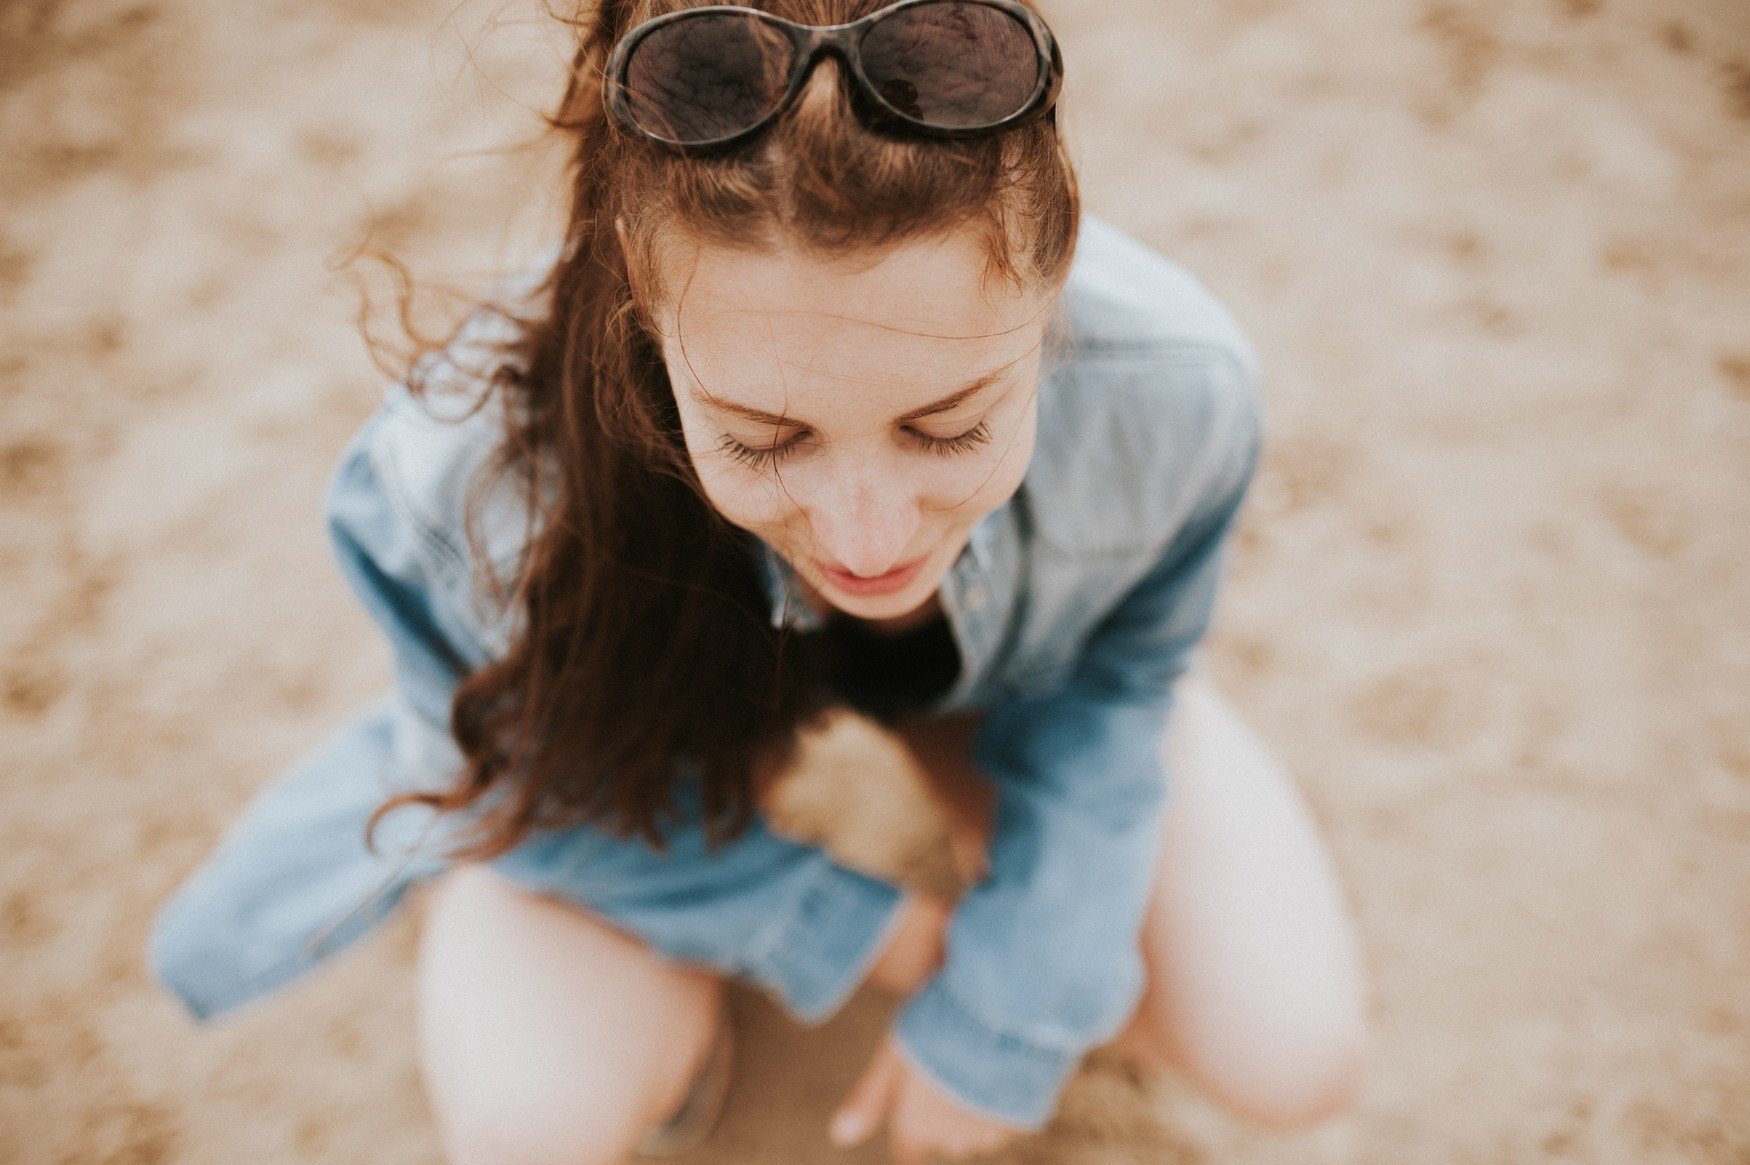 redhead woman crouching looking peaceful in jean jacket